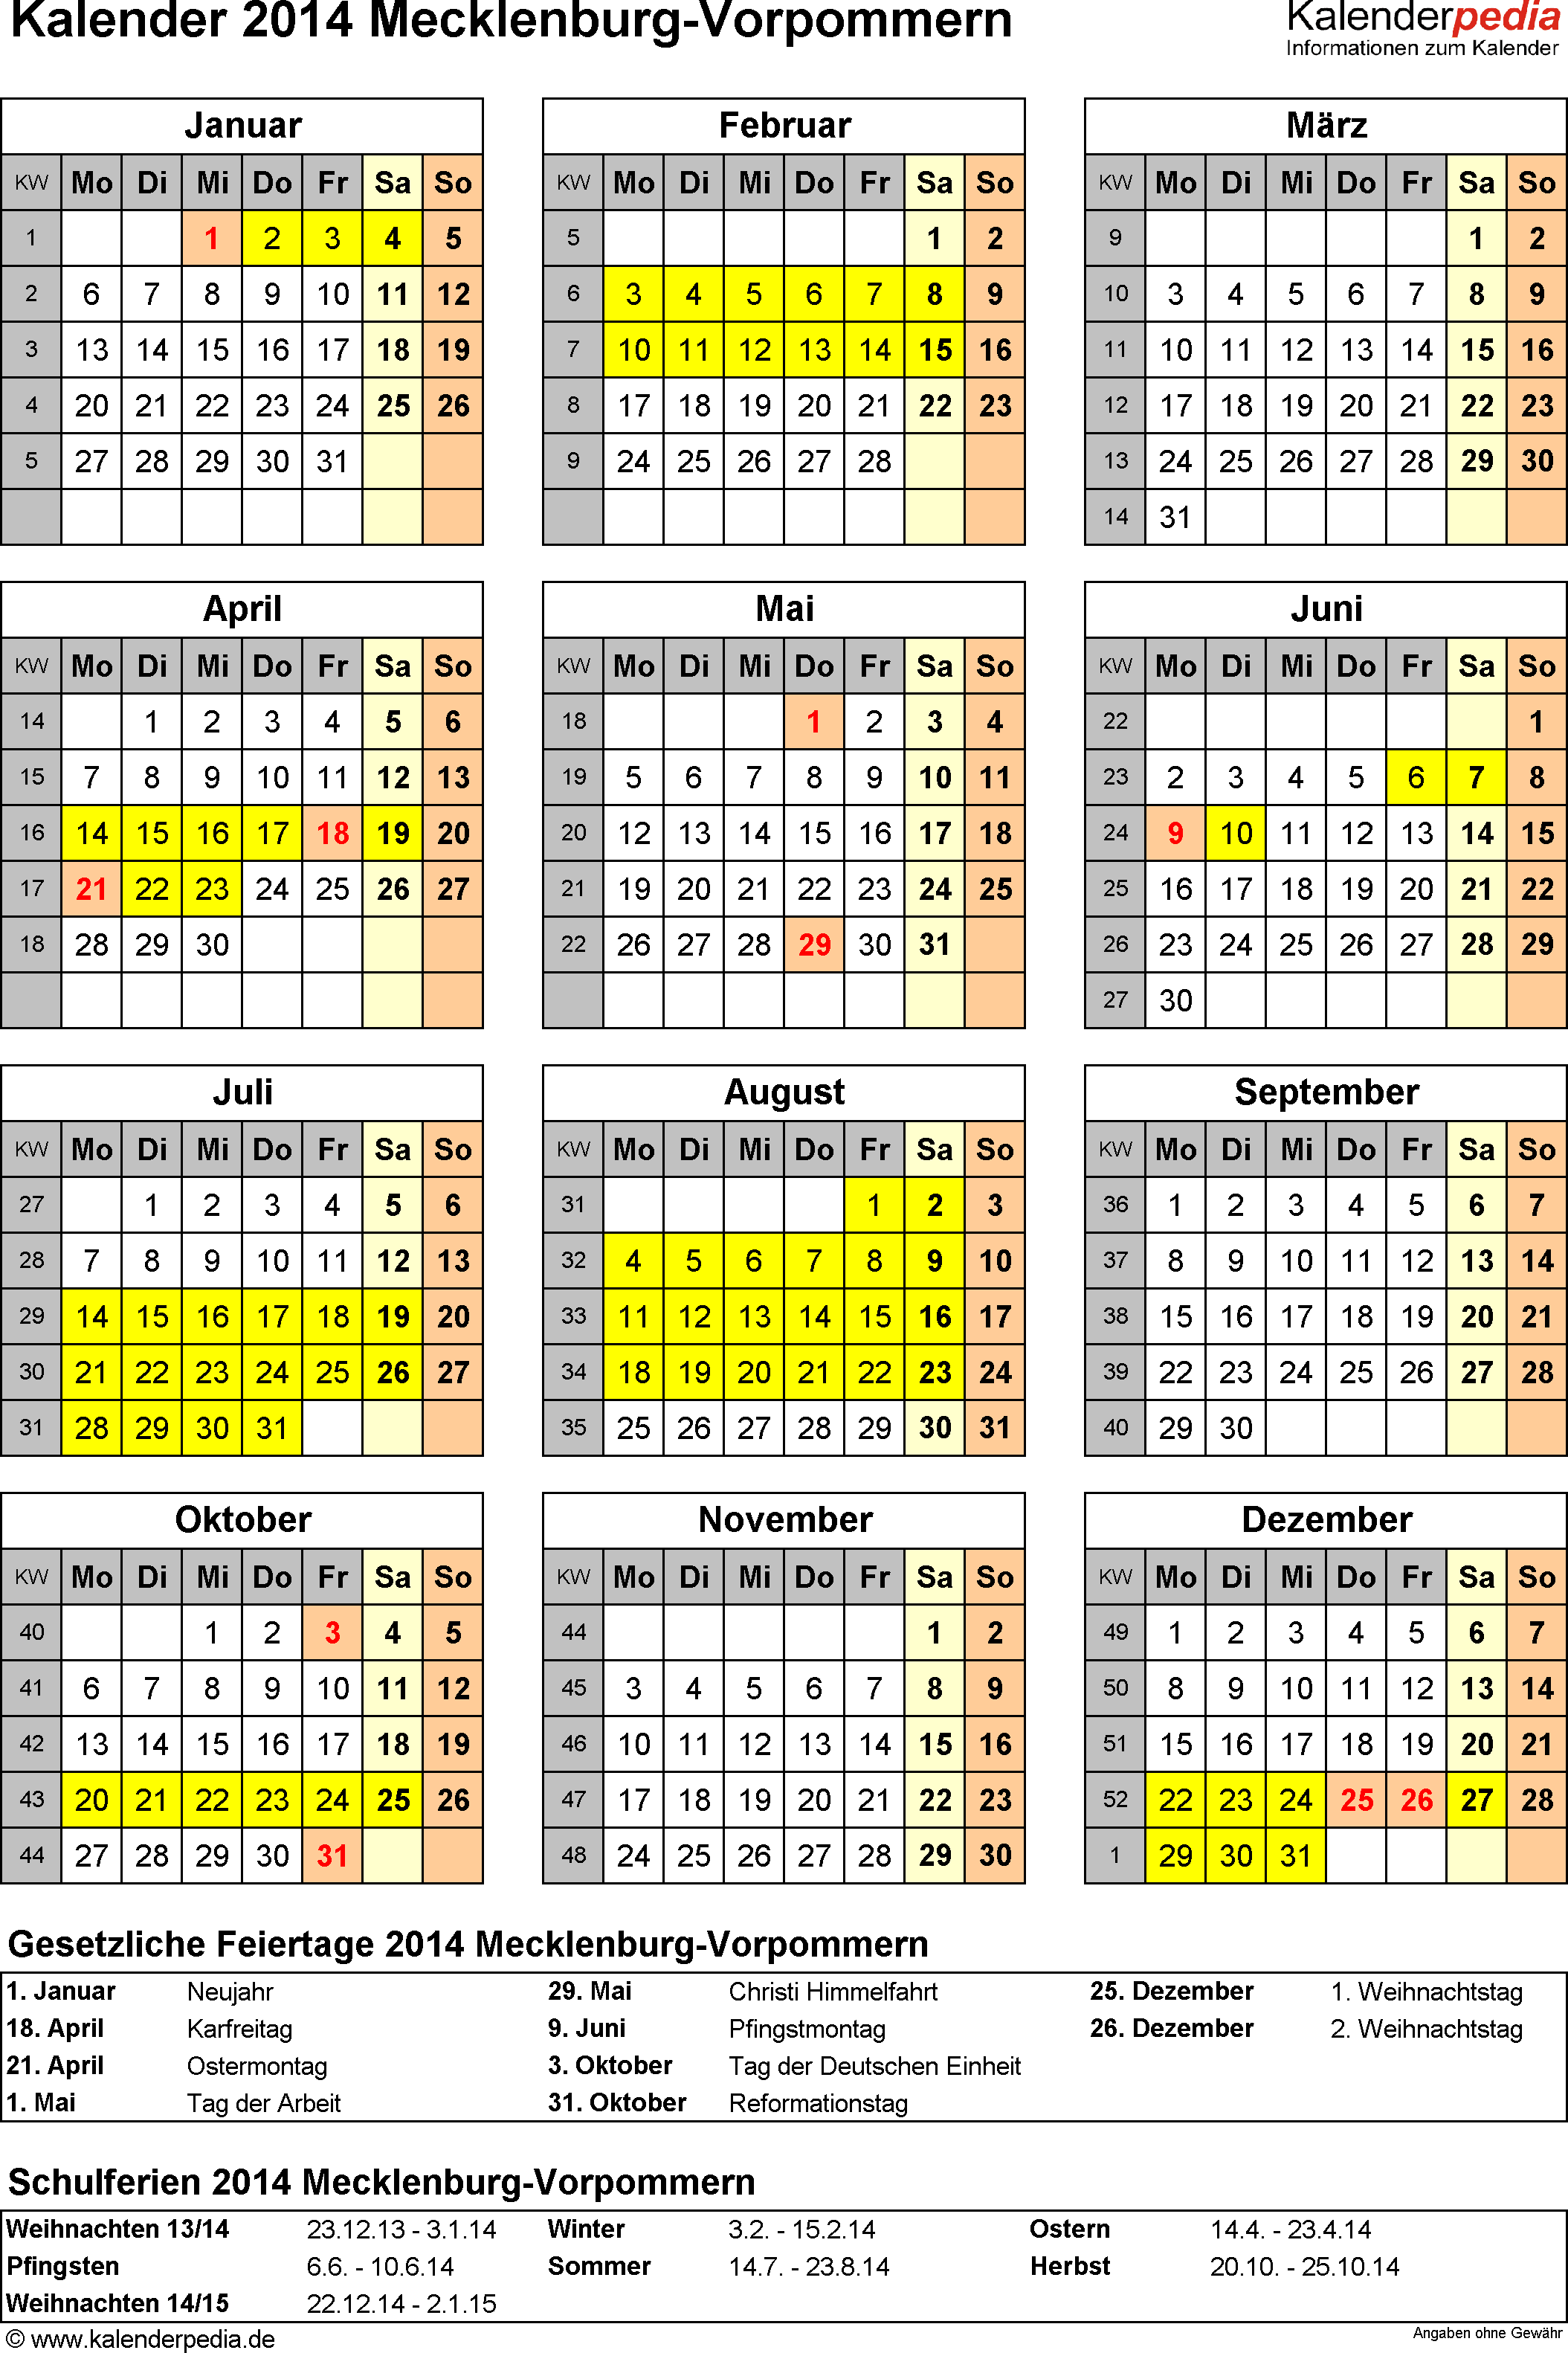 kalender 2014 mecklenburg vorpommern ferien feiertage excel vorlagen. Black Bedroom Furniture Sets. Home Design Ideas